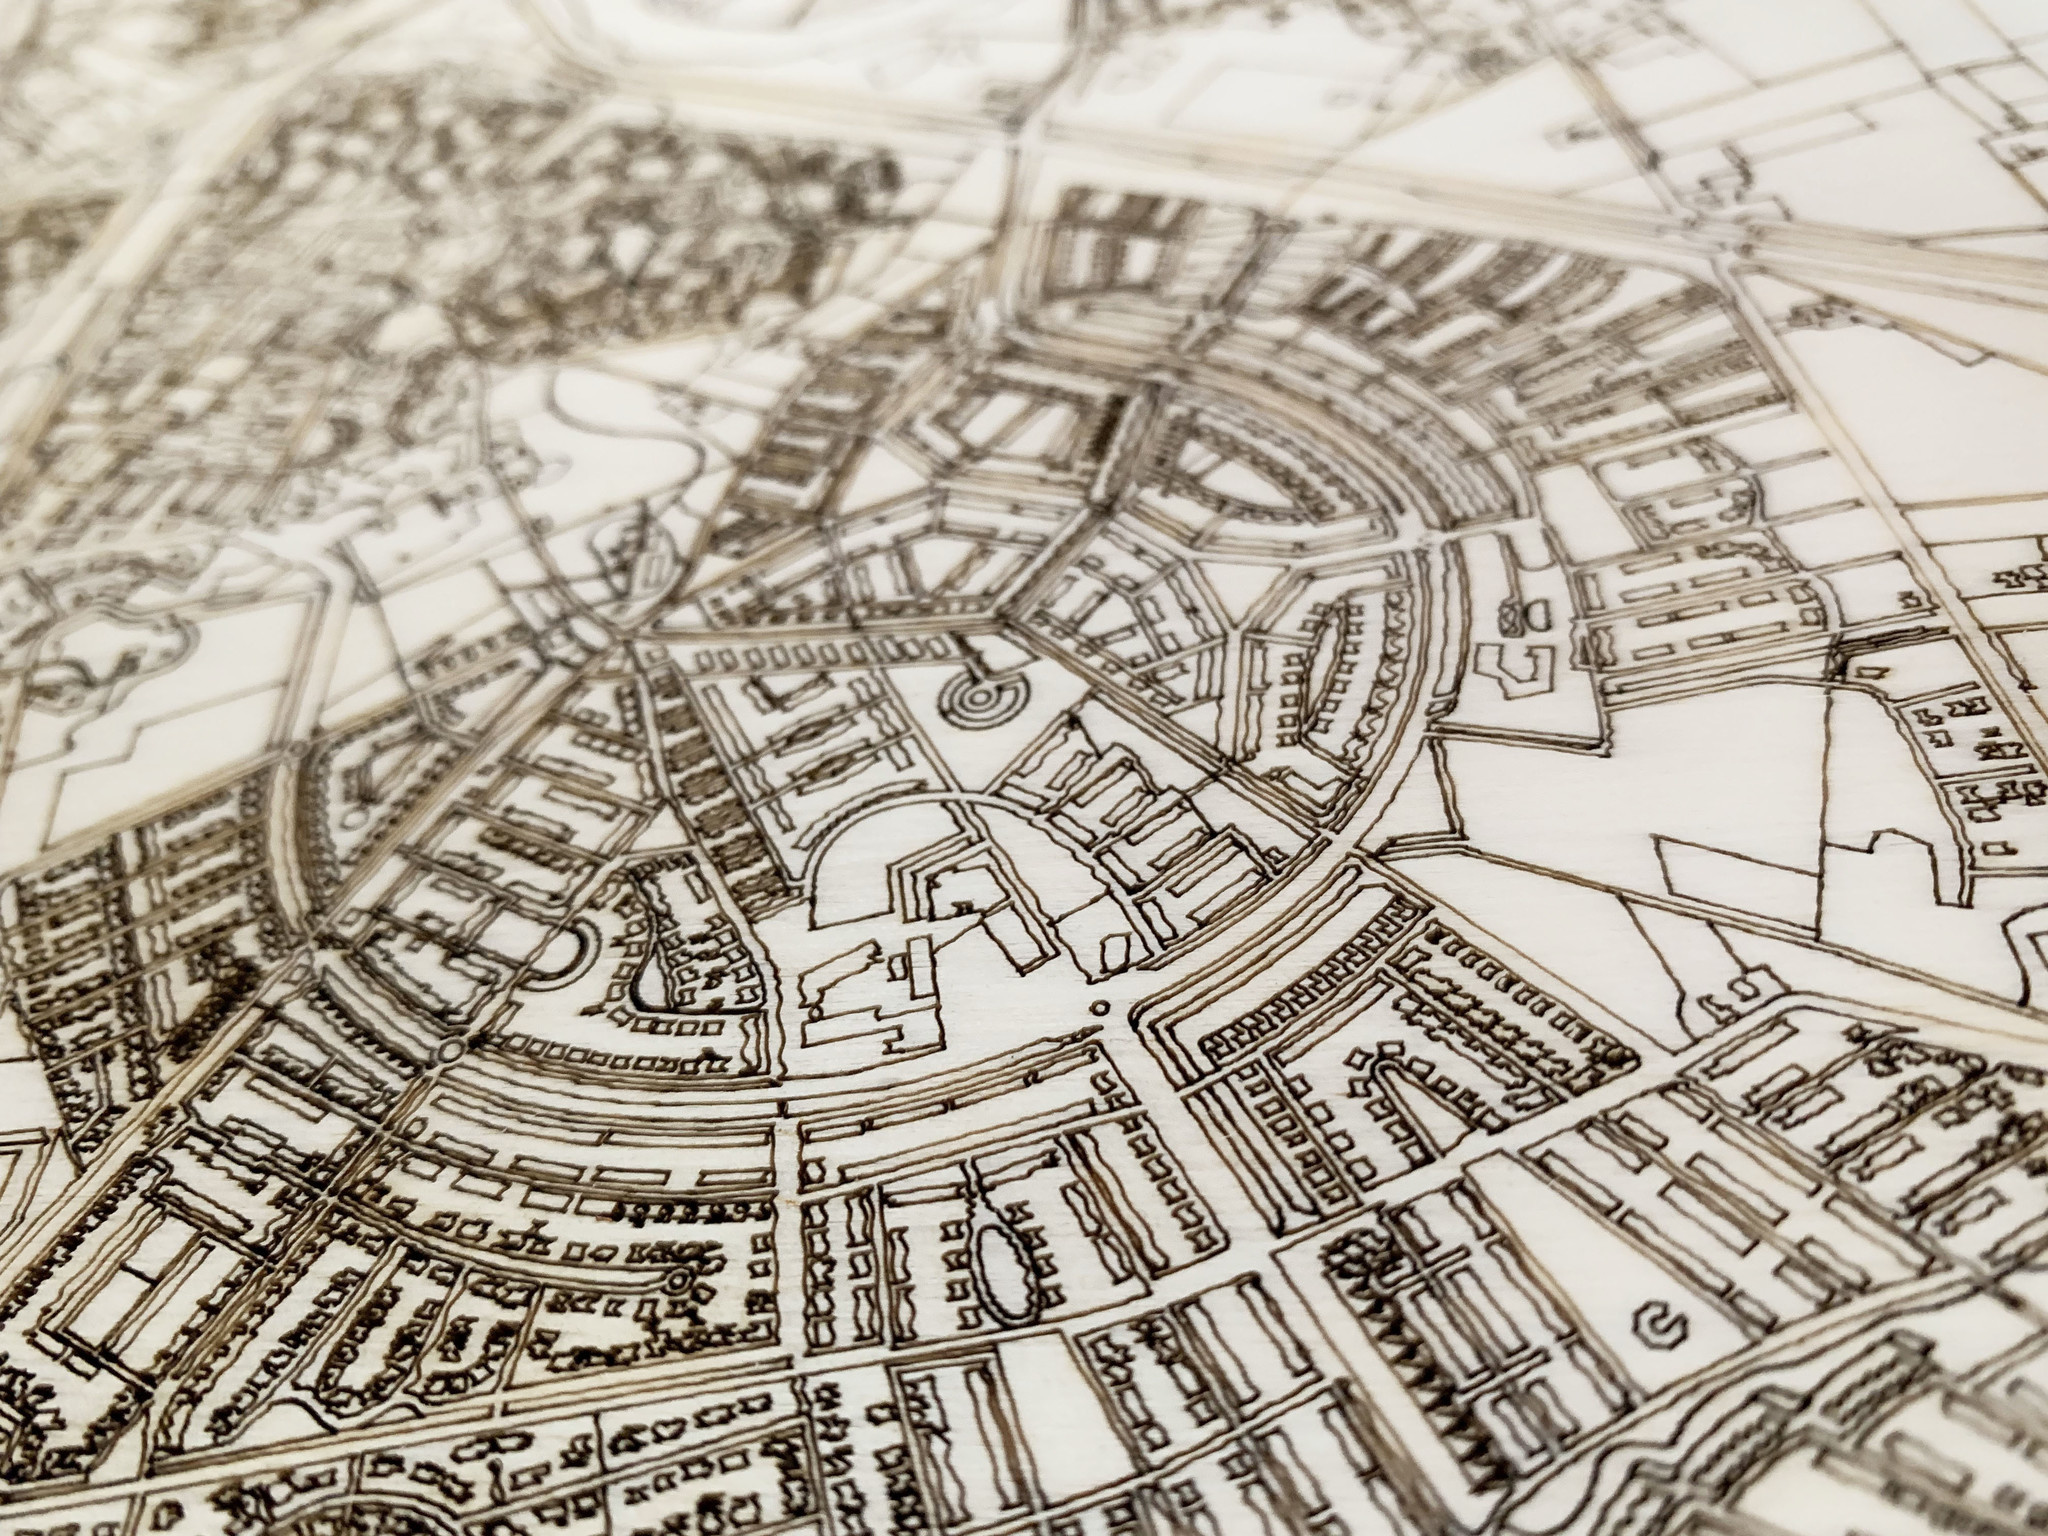 Stadtplan Dokkum | Wanddekoration Holz-4